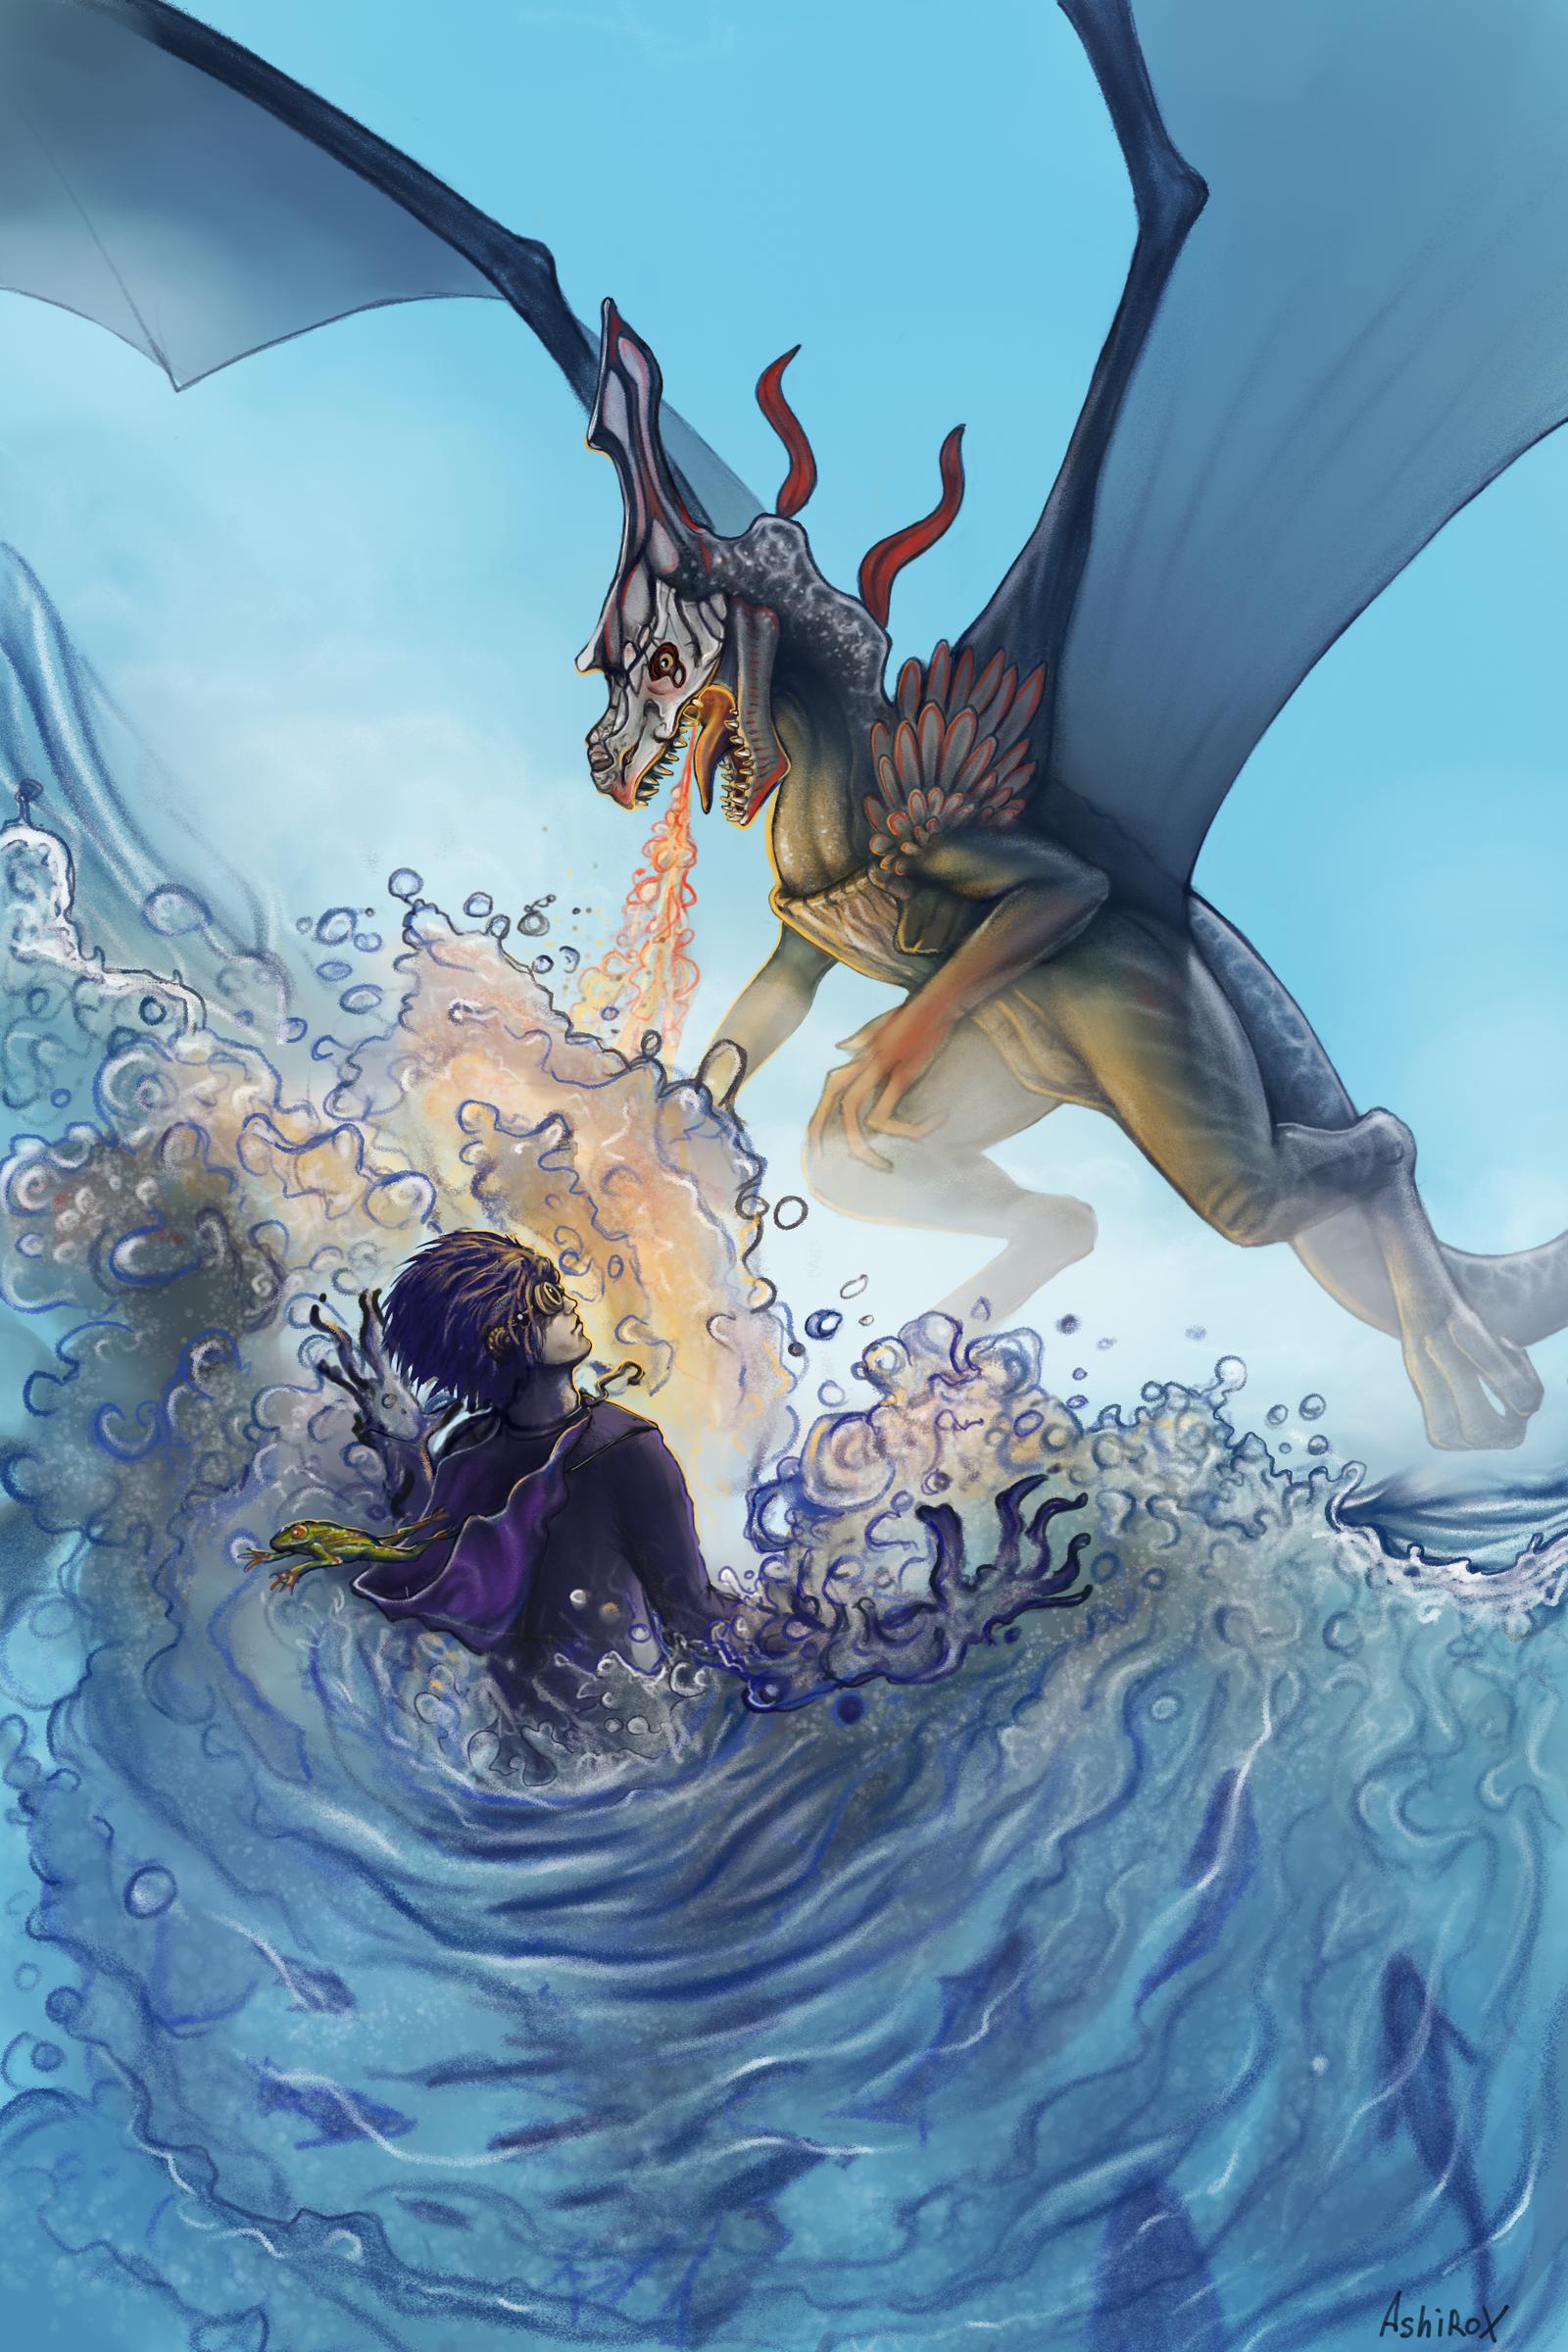 Dragon vs wizard by AshiRox